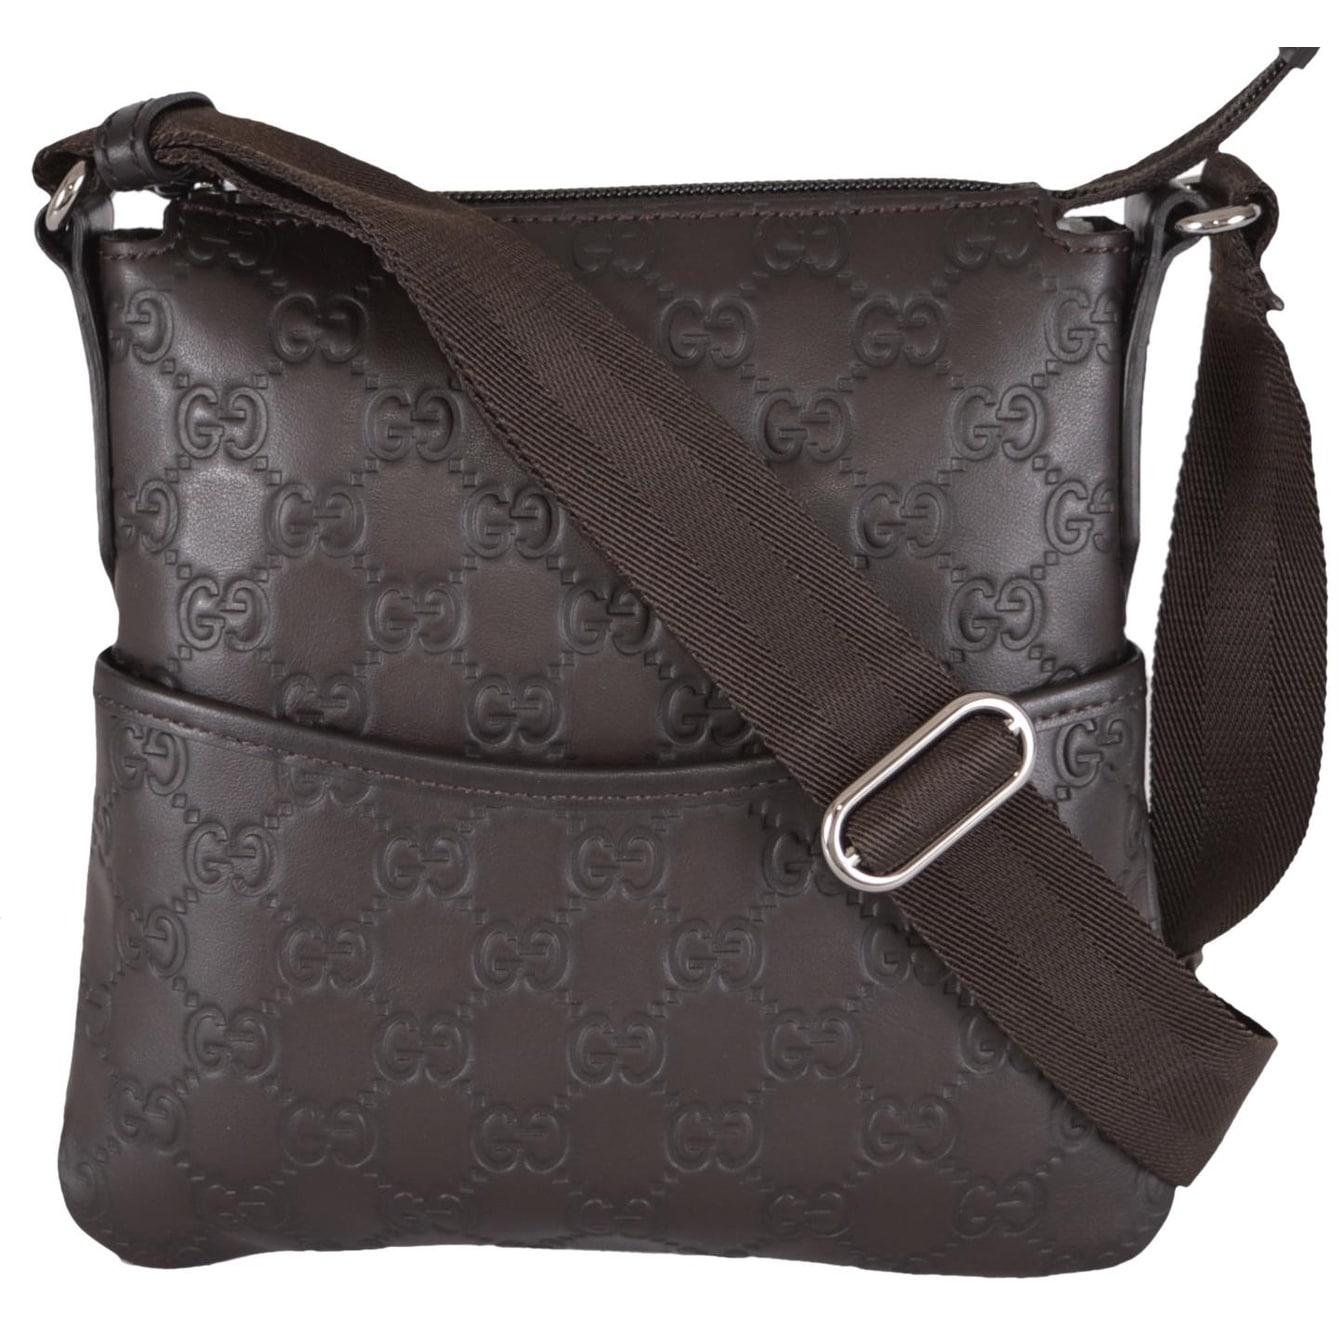 Gucci 374416 MINI Brown Leather GG Guccissima Crossbody Day Purse Bag - Thumbnail 0